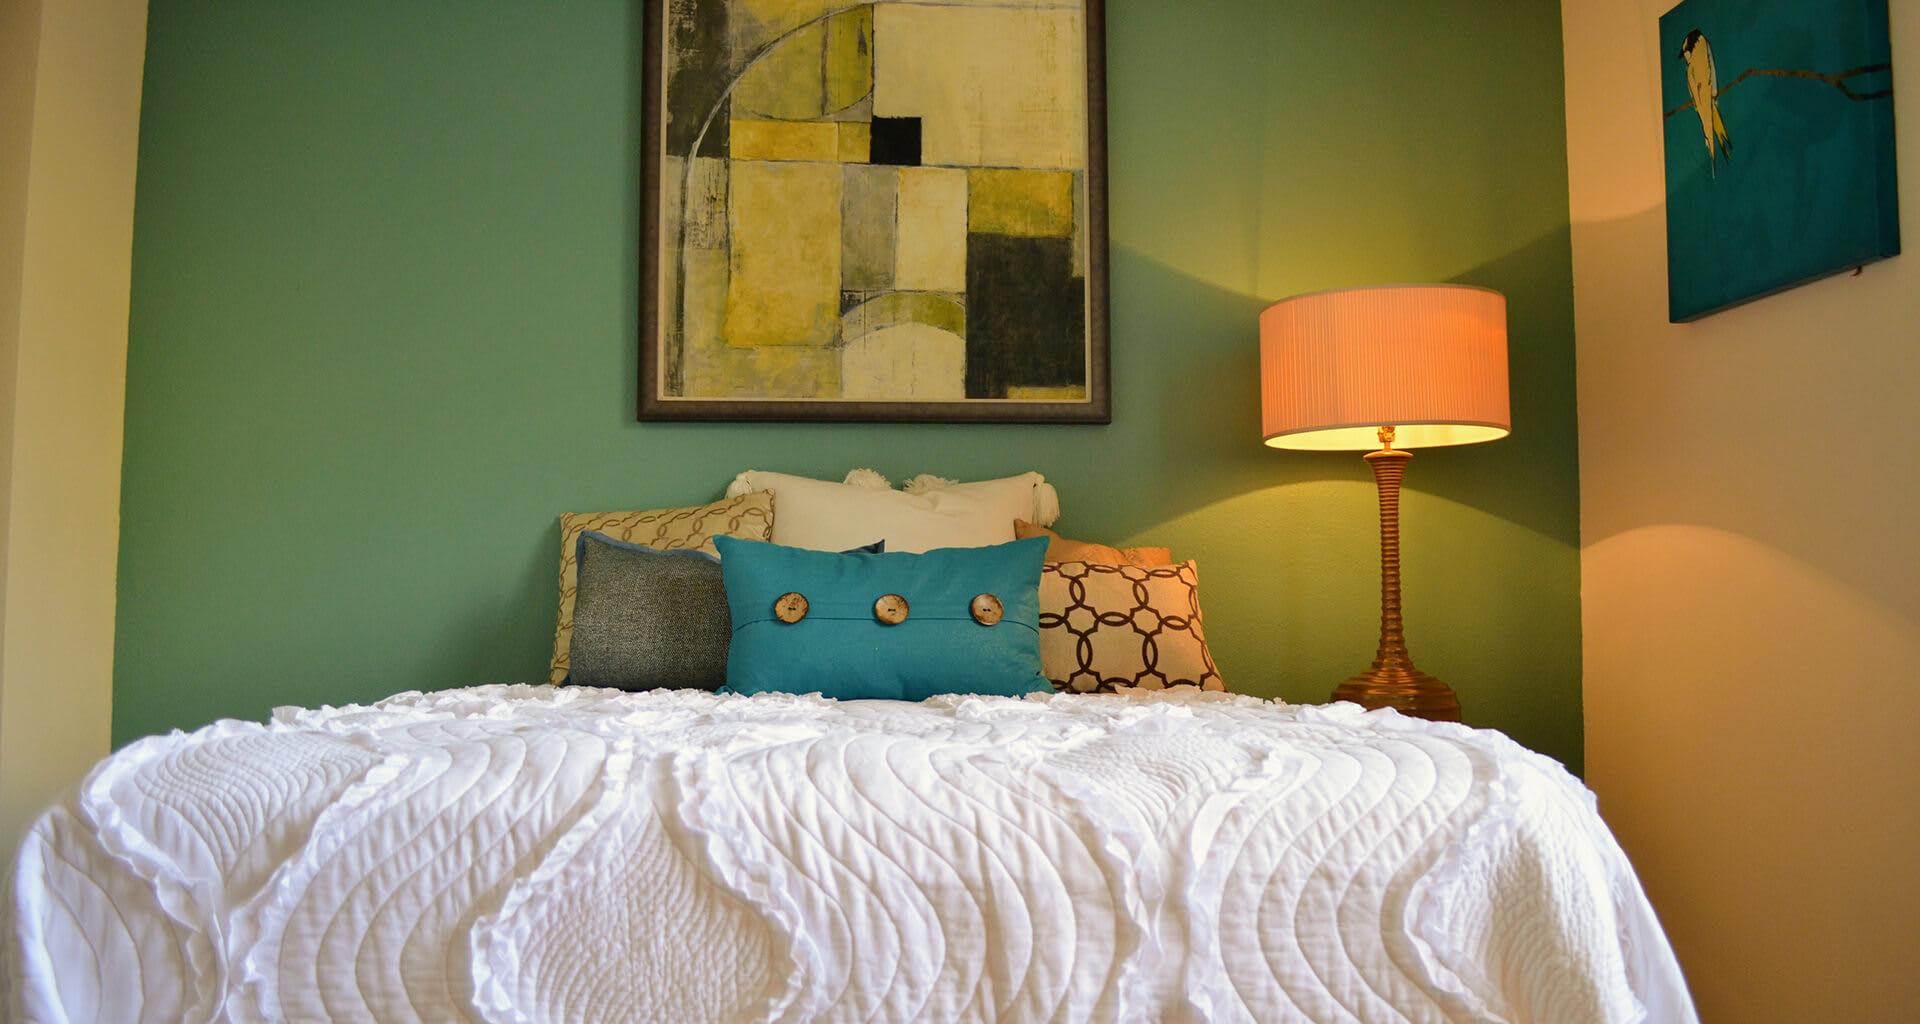 Two Tone Paint Scheme at Sterling Village Apartment Homes, 88 Valle Vista Avenue, Vallejo